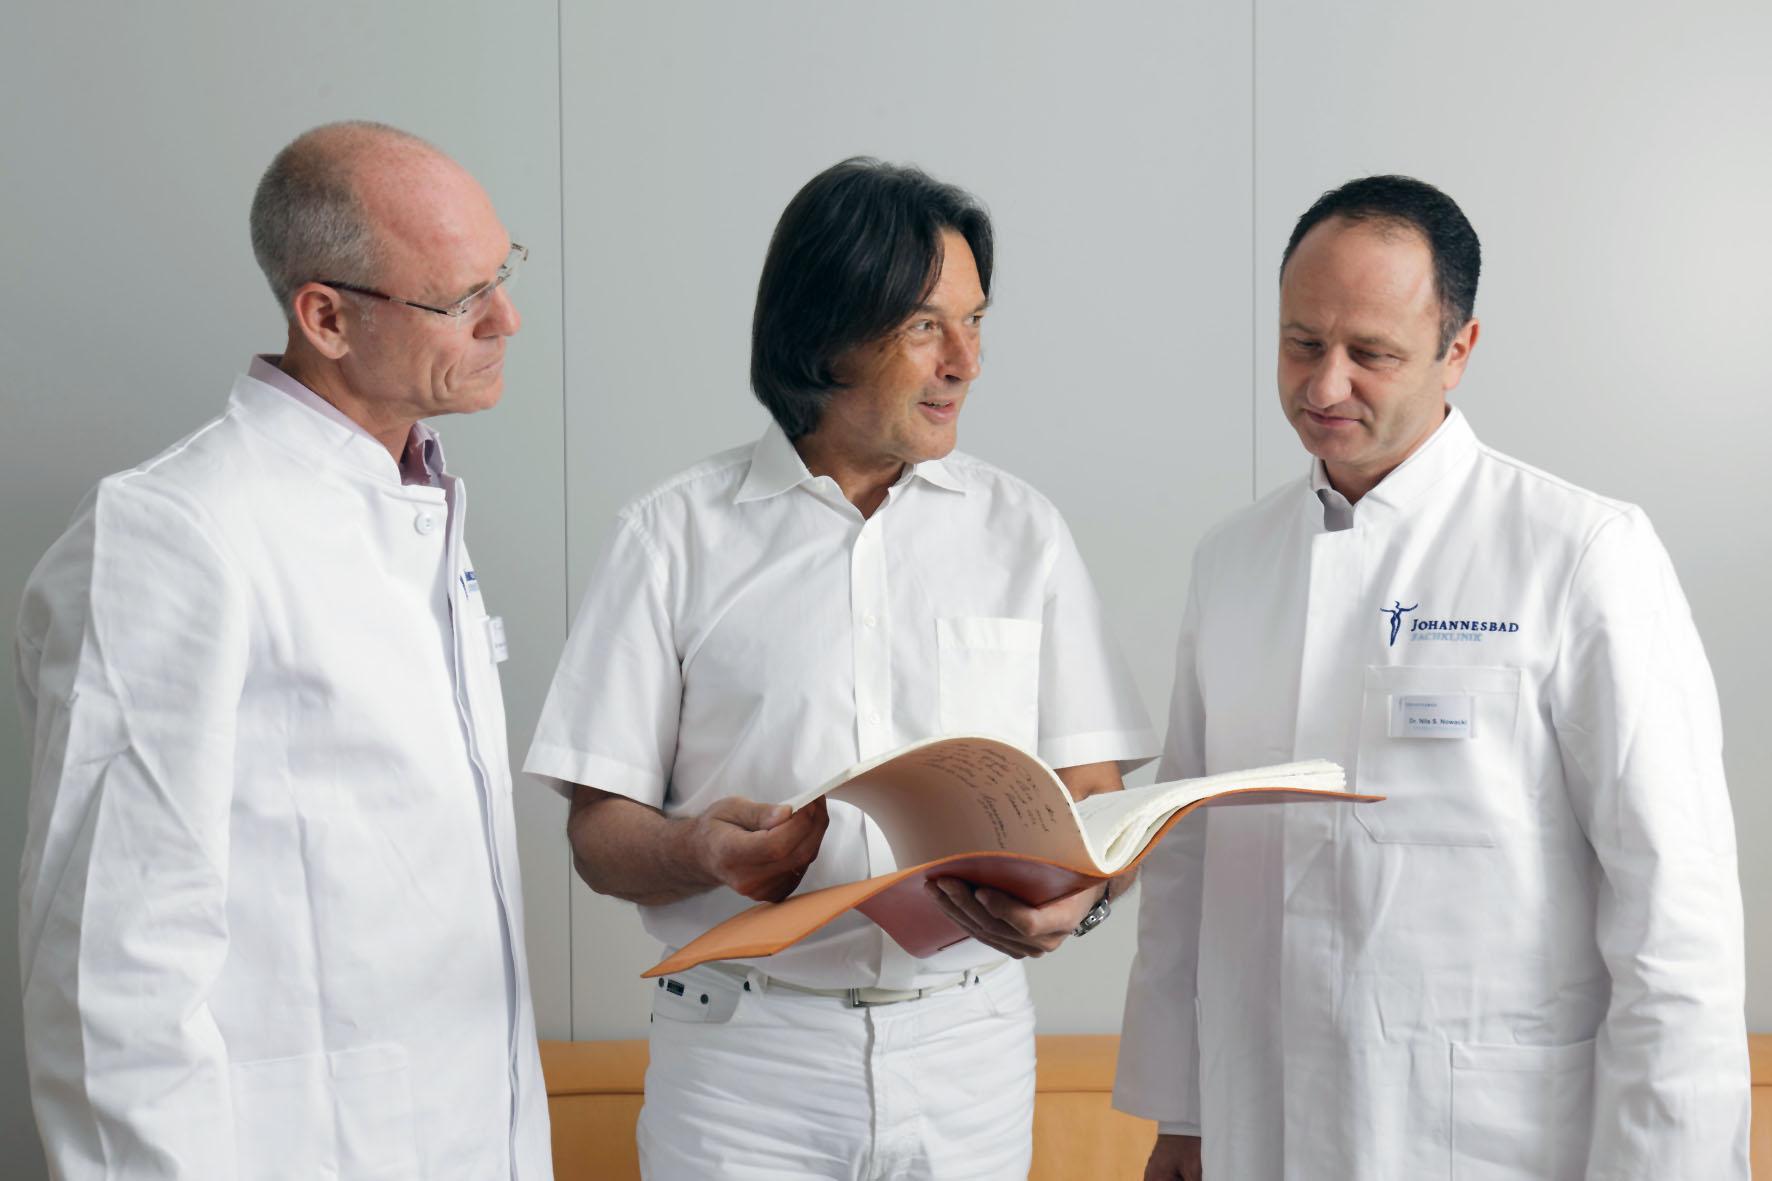 Dr. Hans-Wilhelm Müller-Wohlfahrt Praxis